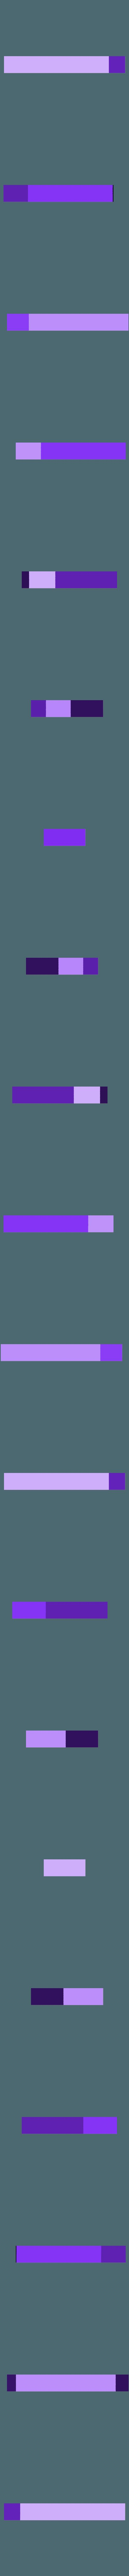 ArrayBlank_v1.stl Download free STL file Body Part Arrow Magnets • 3D printable model, EmbossIndustries